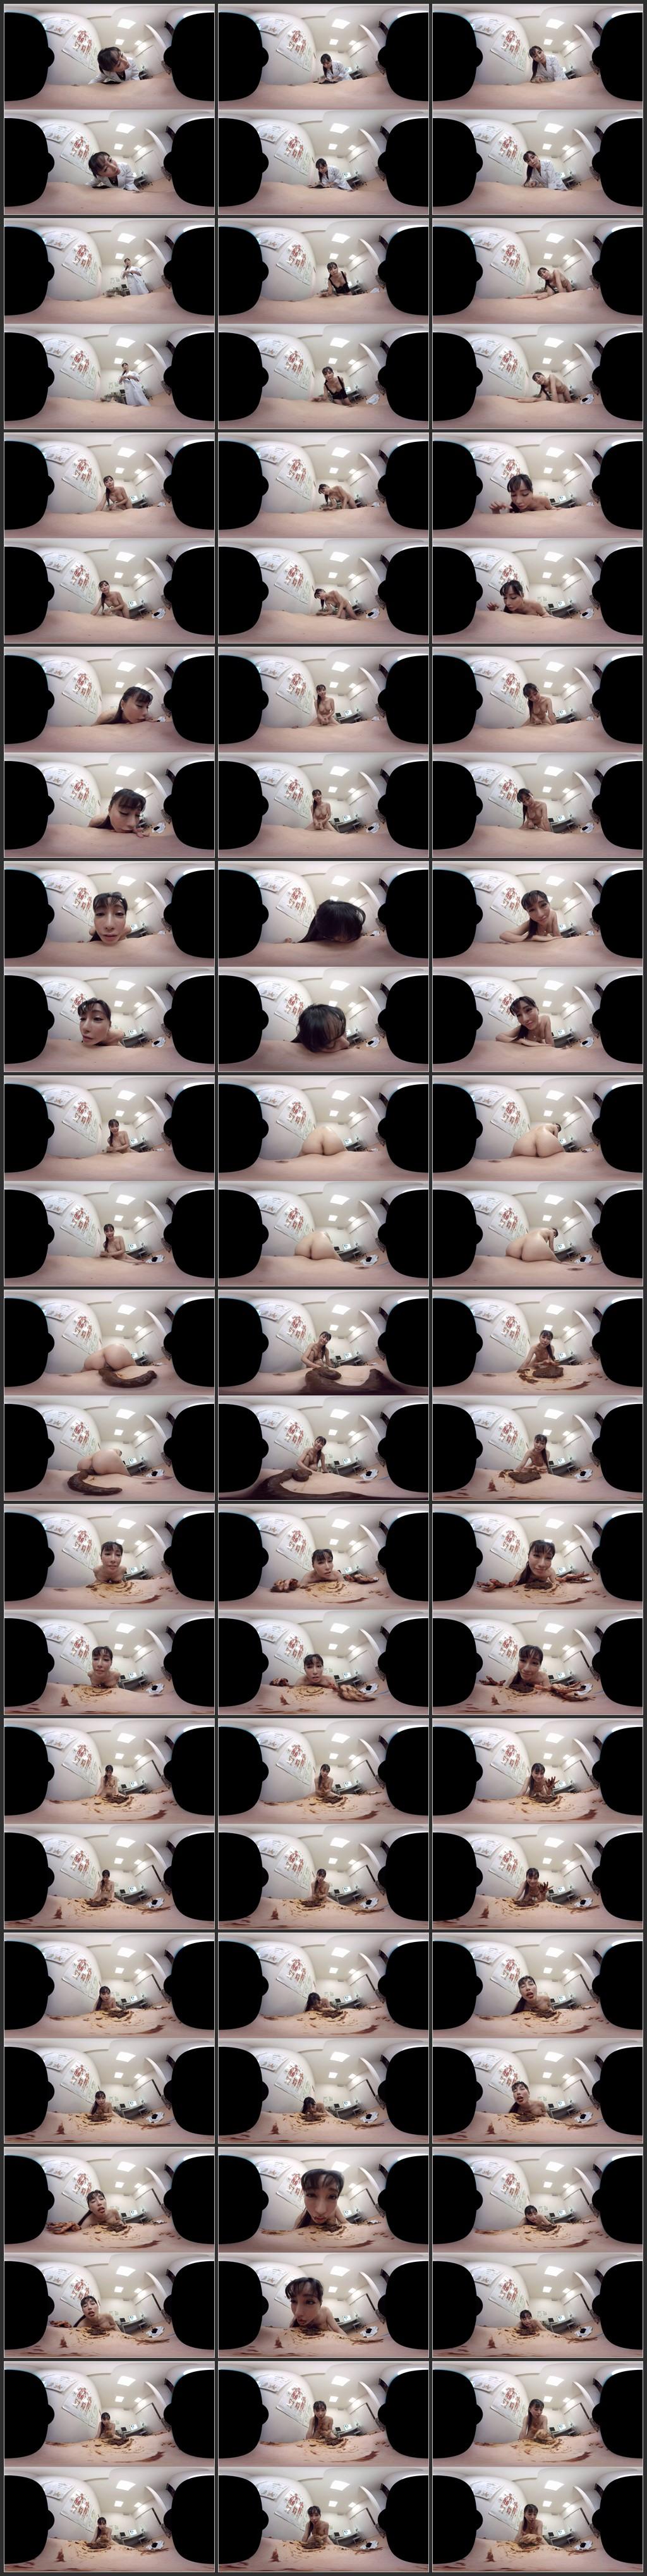 OPVR 005 - [OPVR-005] - Scat.  【VR】絶景VR!脱糞見せつけ糞フェラ遊戯! 逢沢はるか逢沢はるか単体作品 人妻 痴女 主観 スカトロ VR